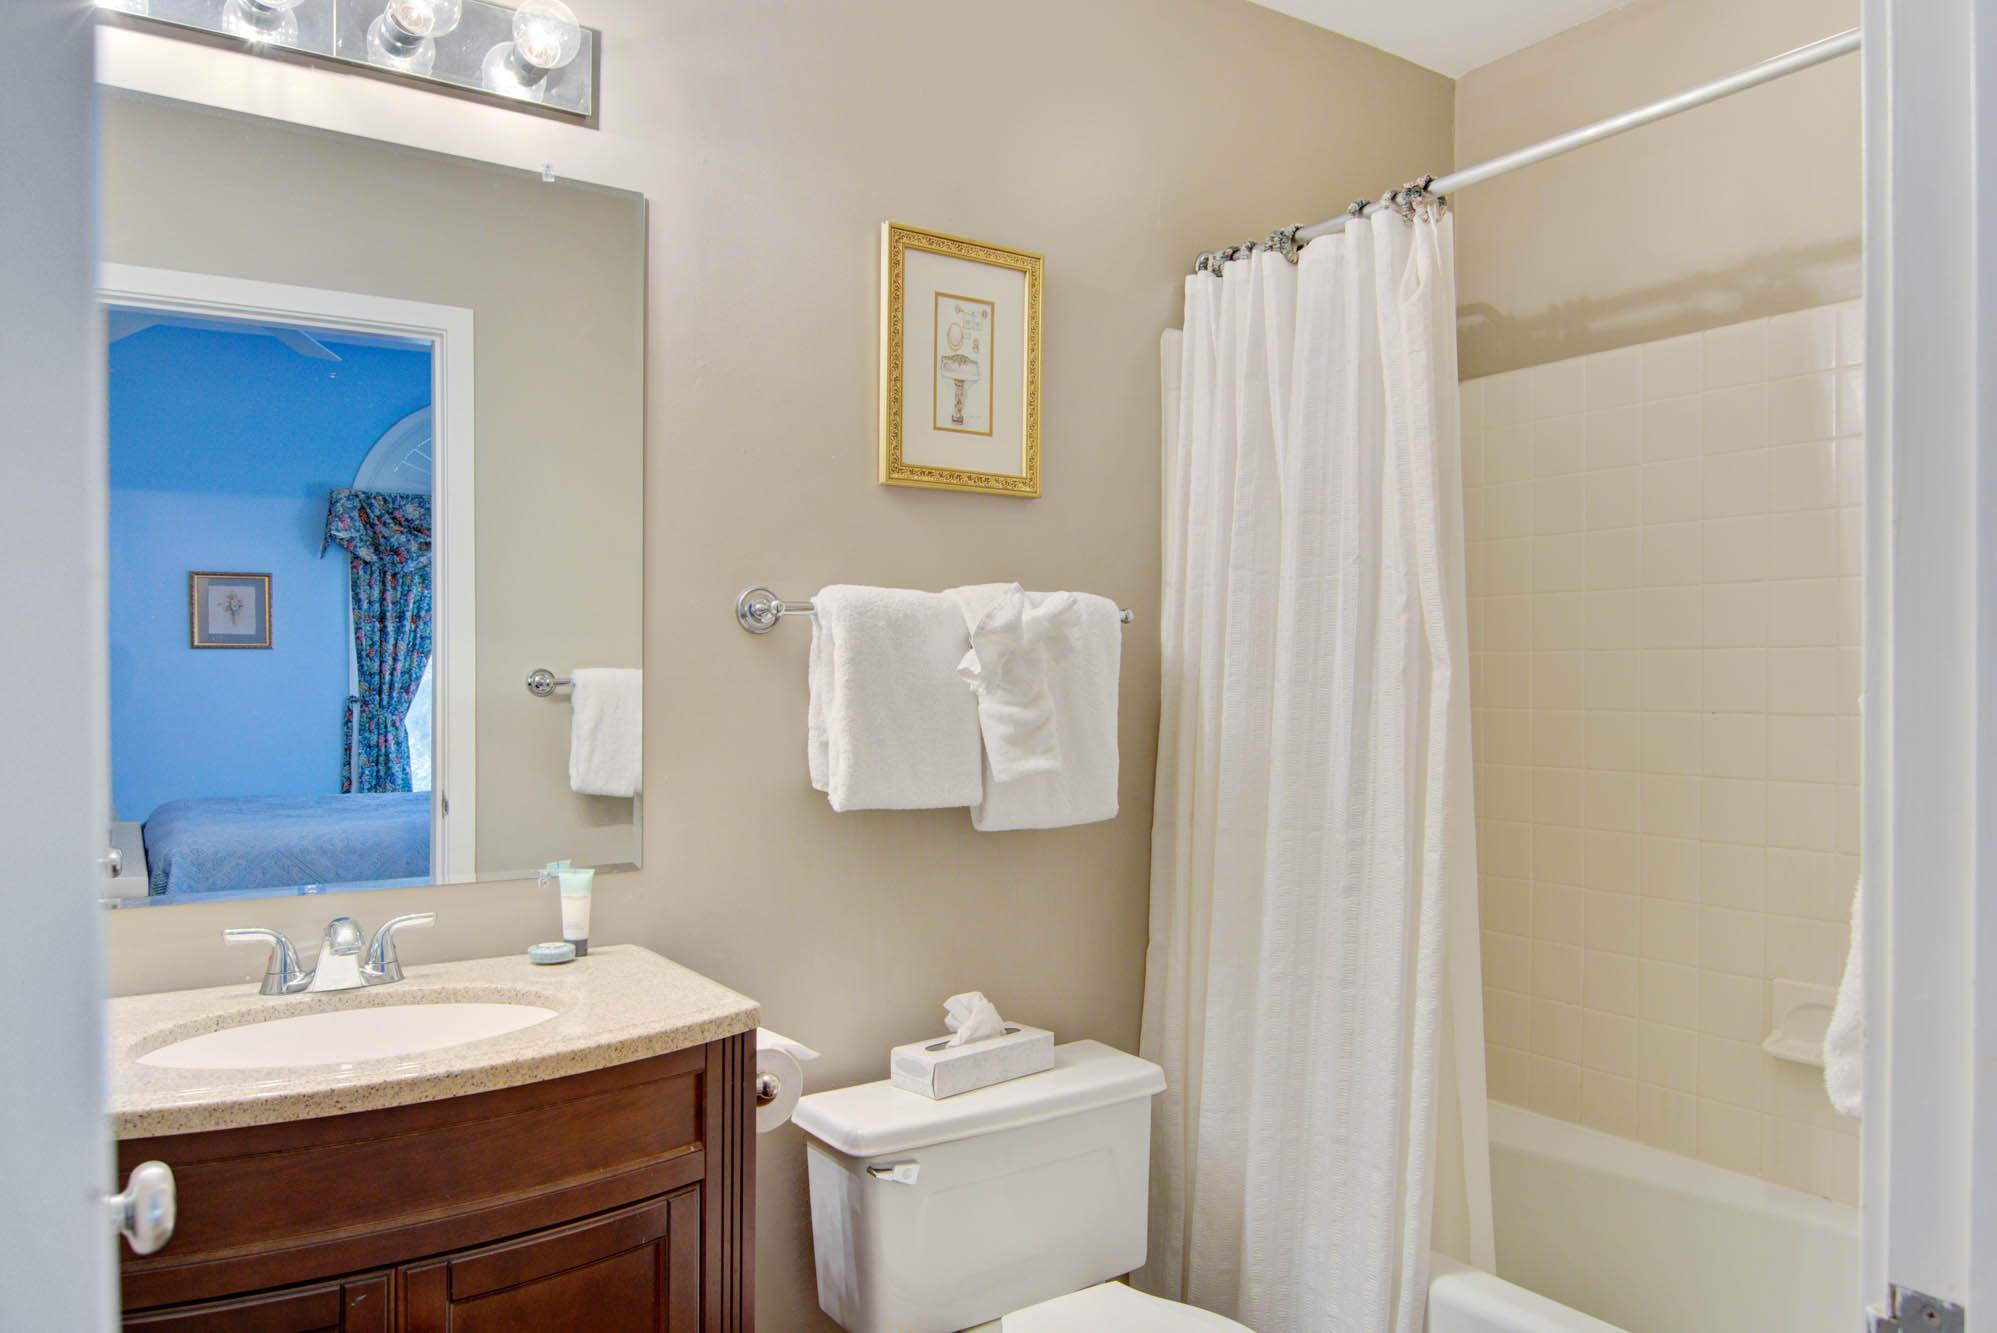 Kiawah Island Homes For Sale - 4504 Park Lake, Kiawah Island, SC - 11